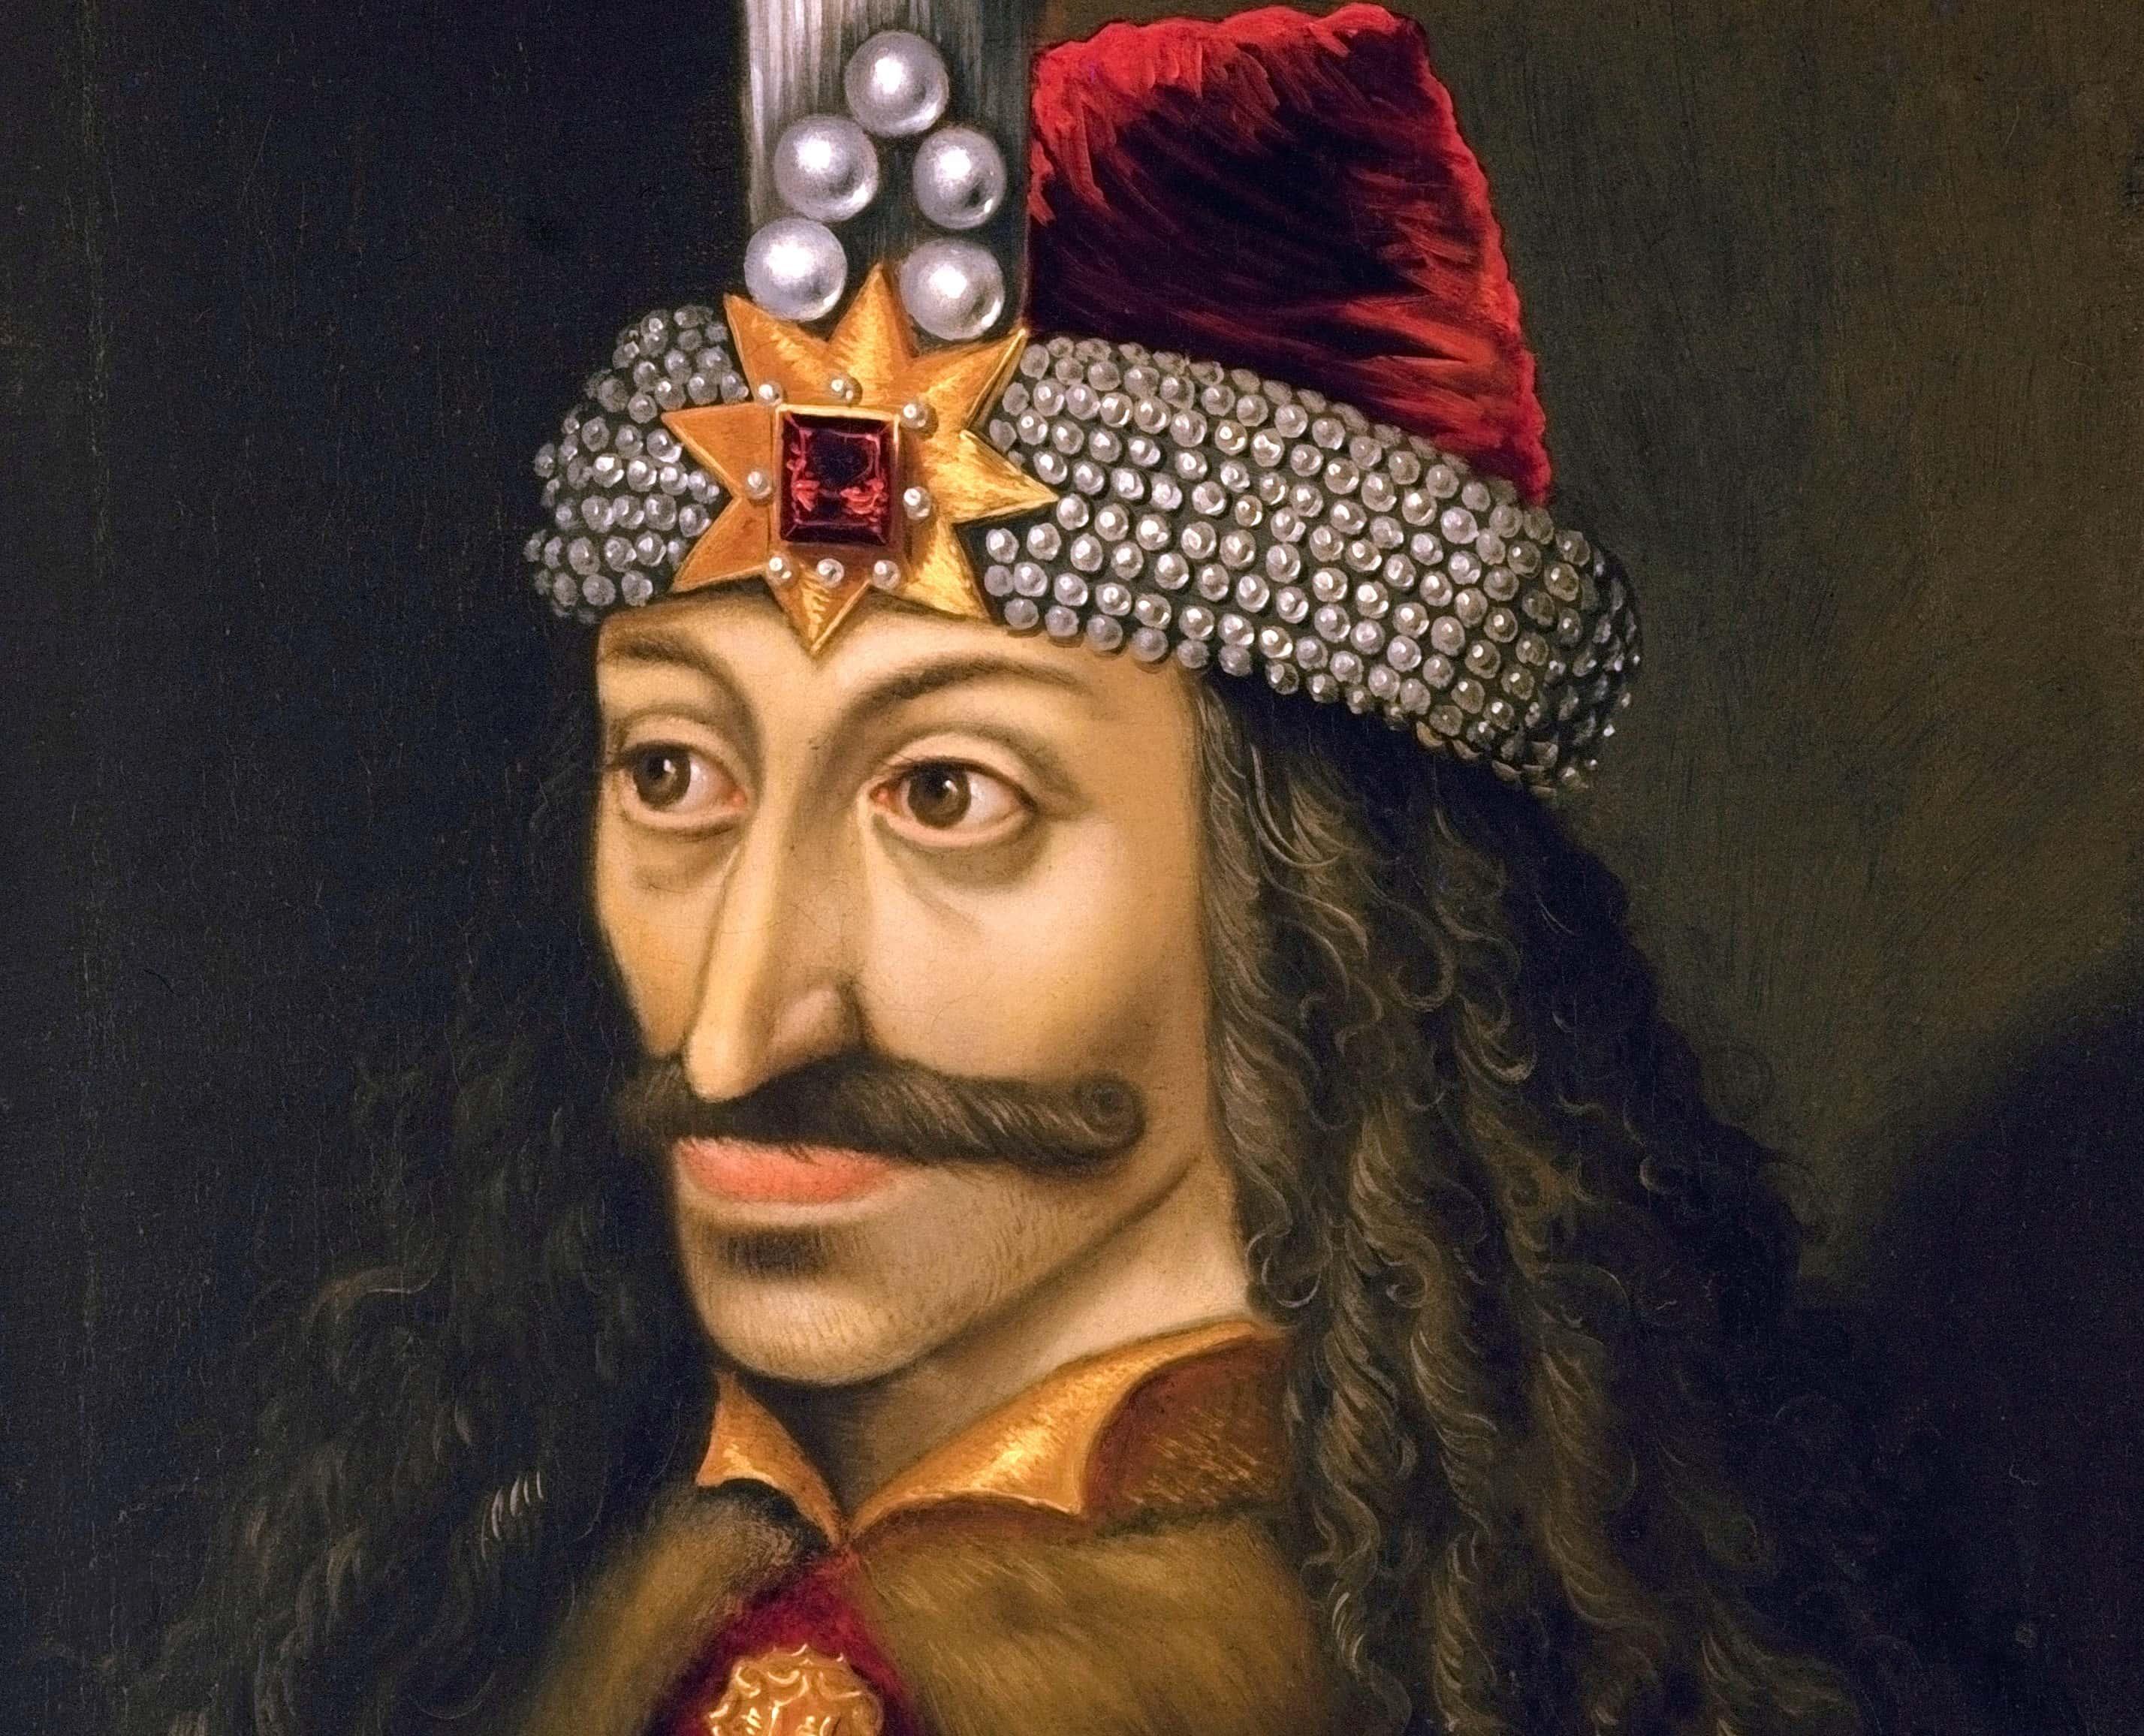 Scandalous Historical Facts